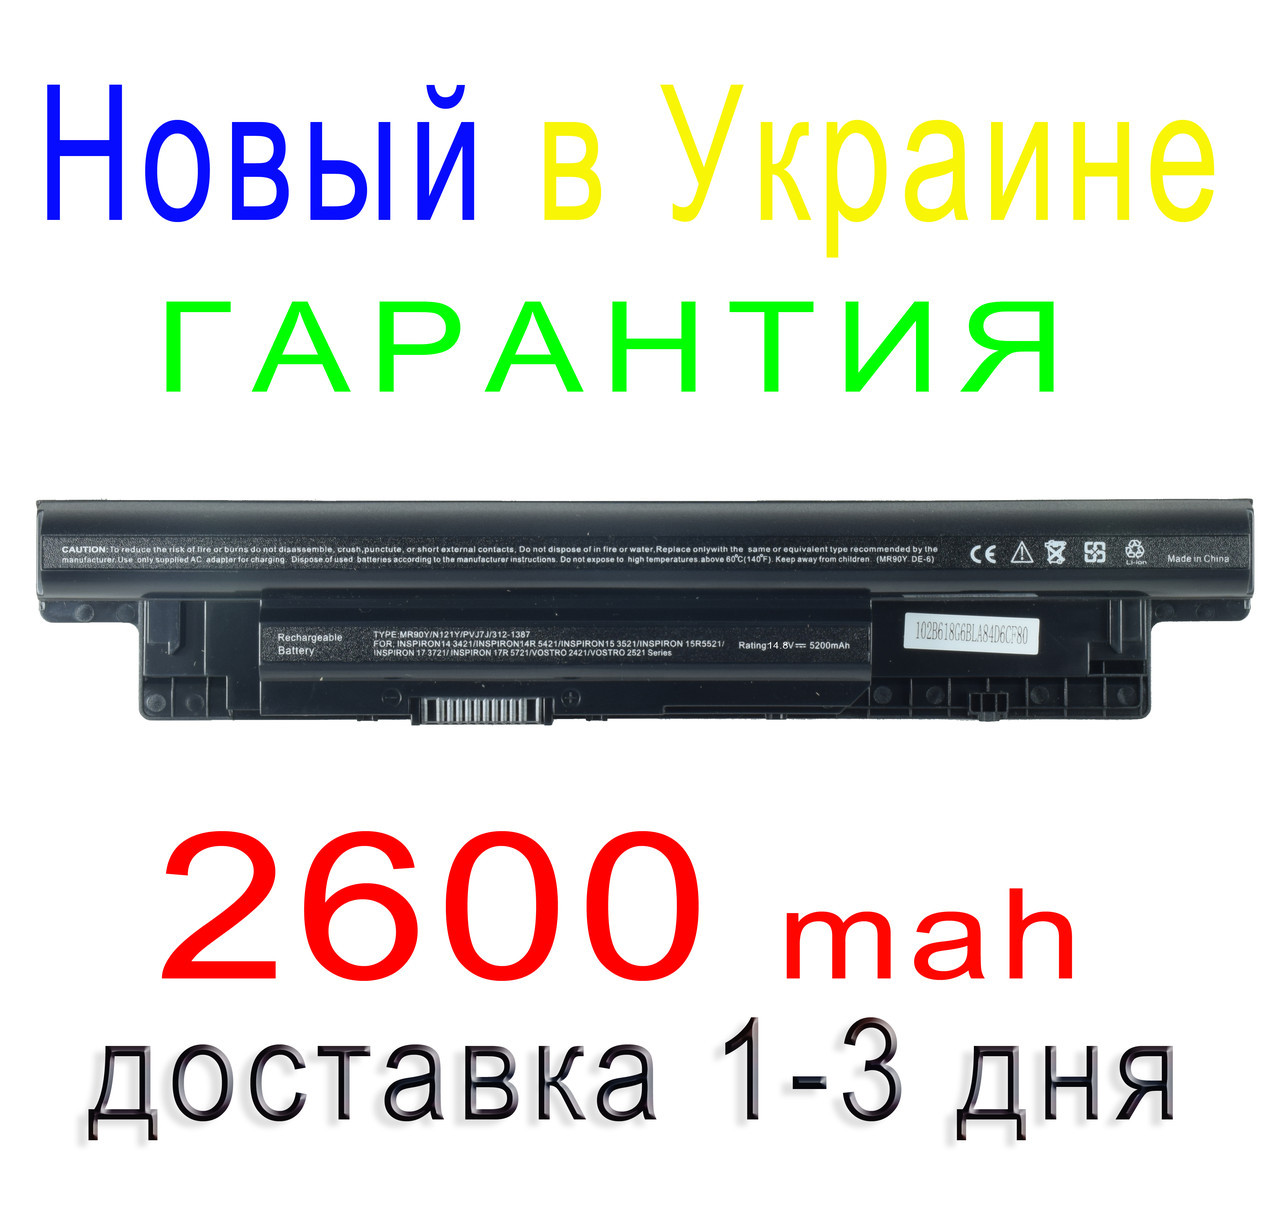 Аккумулятор батарея DELL Inspiron 17R-5737 3443 3531 3543 Latitude 3440 Latitude 3540 Vostro 2421  2521 14.4 В